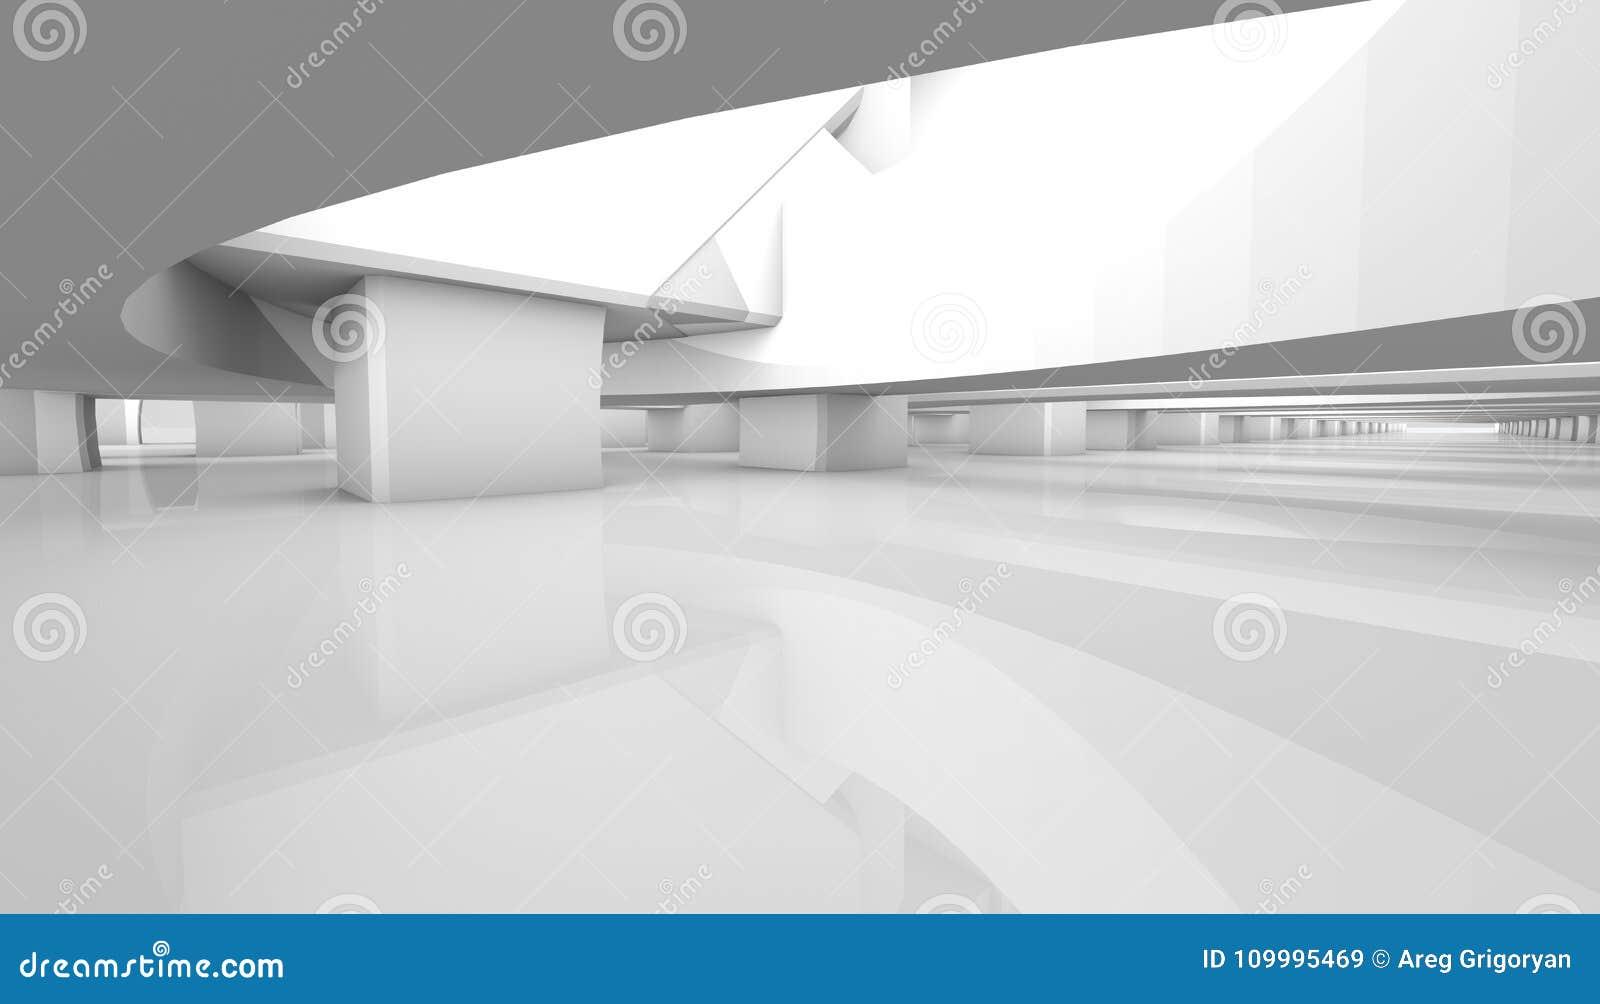 Fondo arquitectónico blanco representación paramétrica 3d